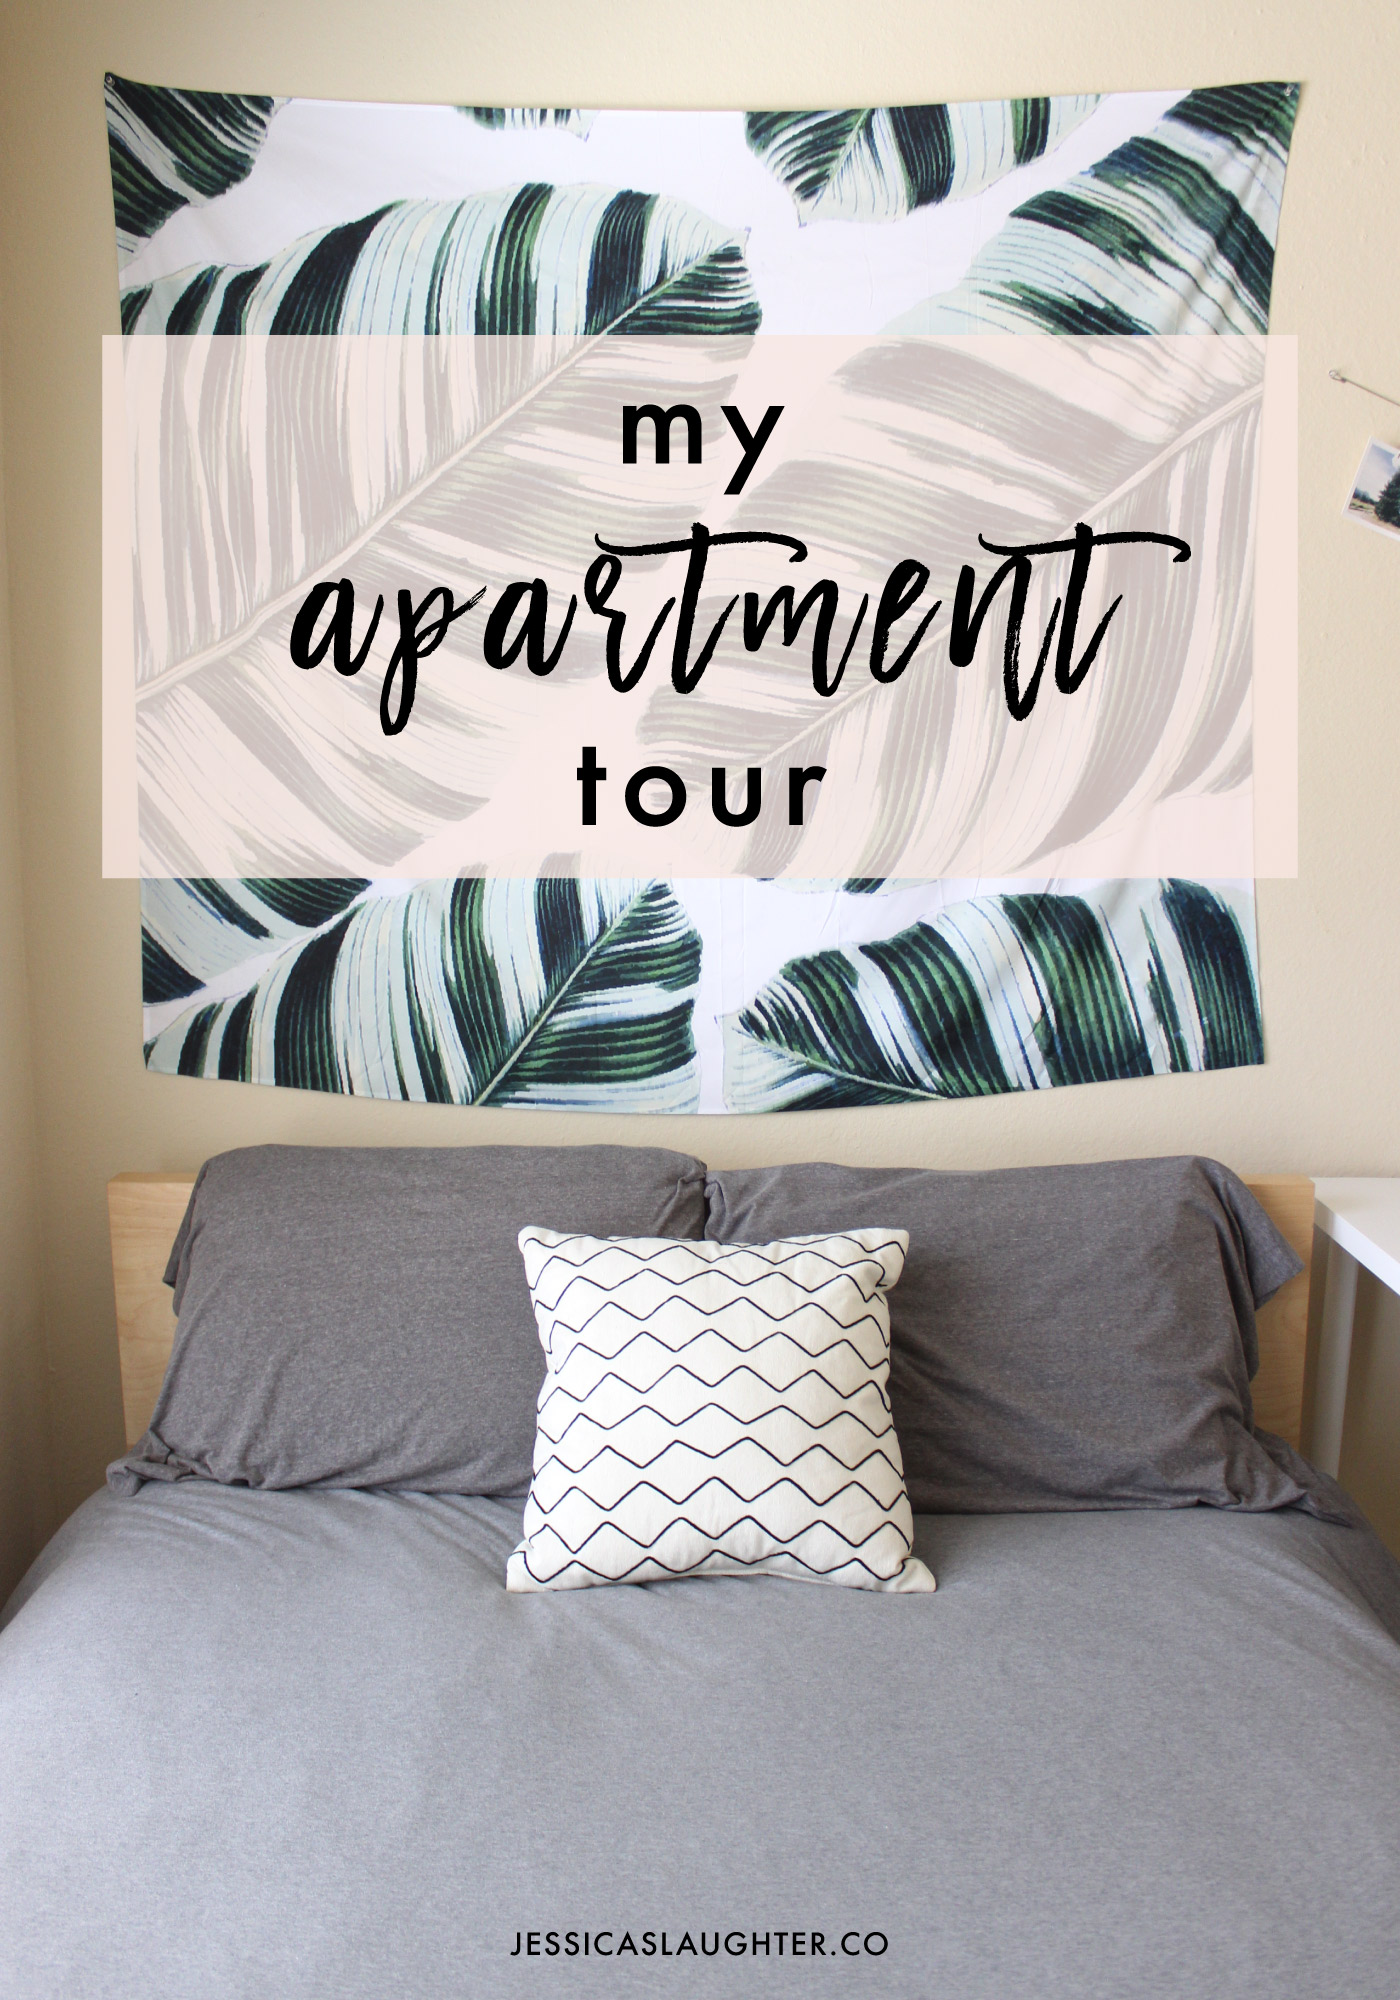 Apartment Tour 2016 | Jessica Slaughter